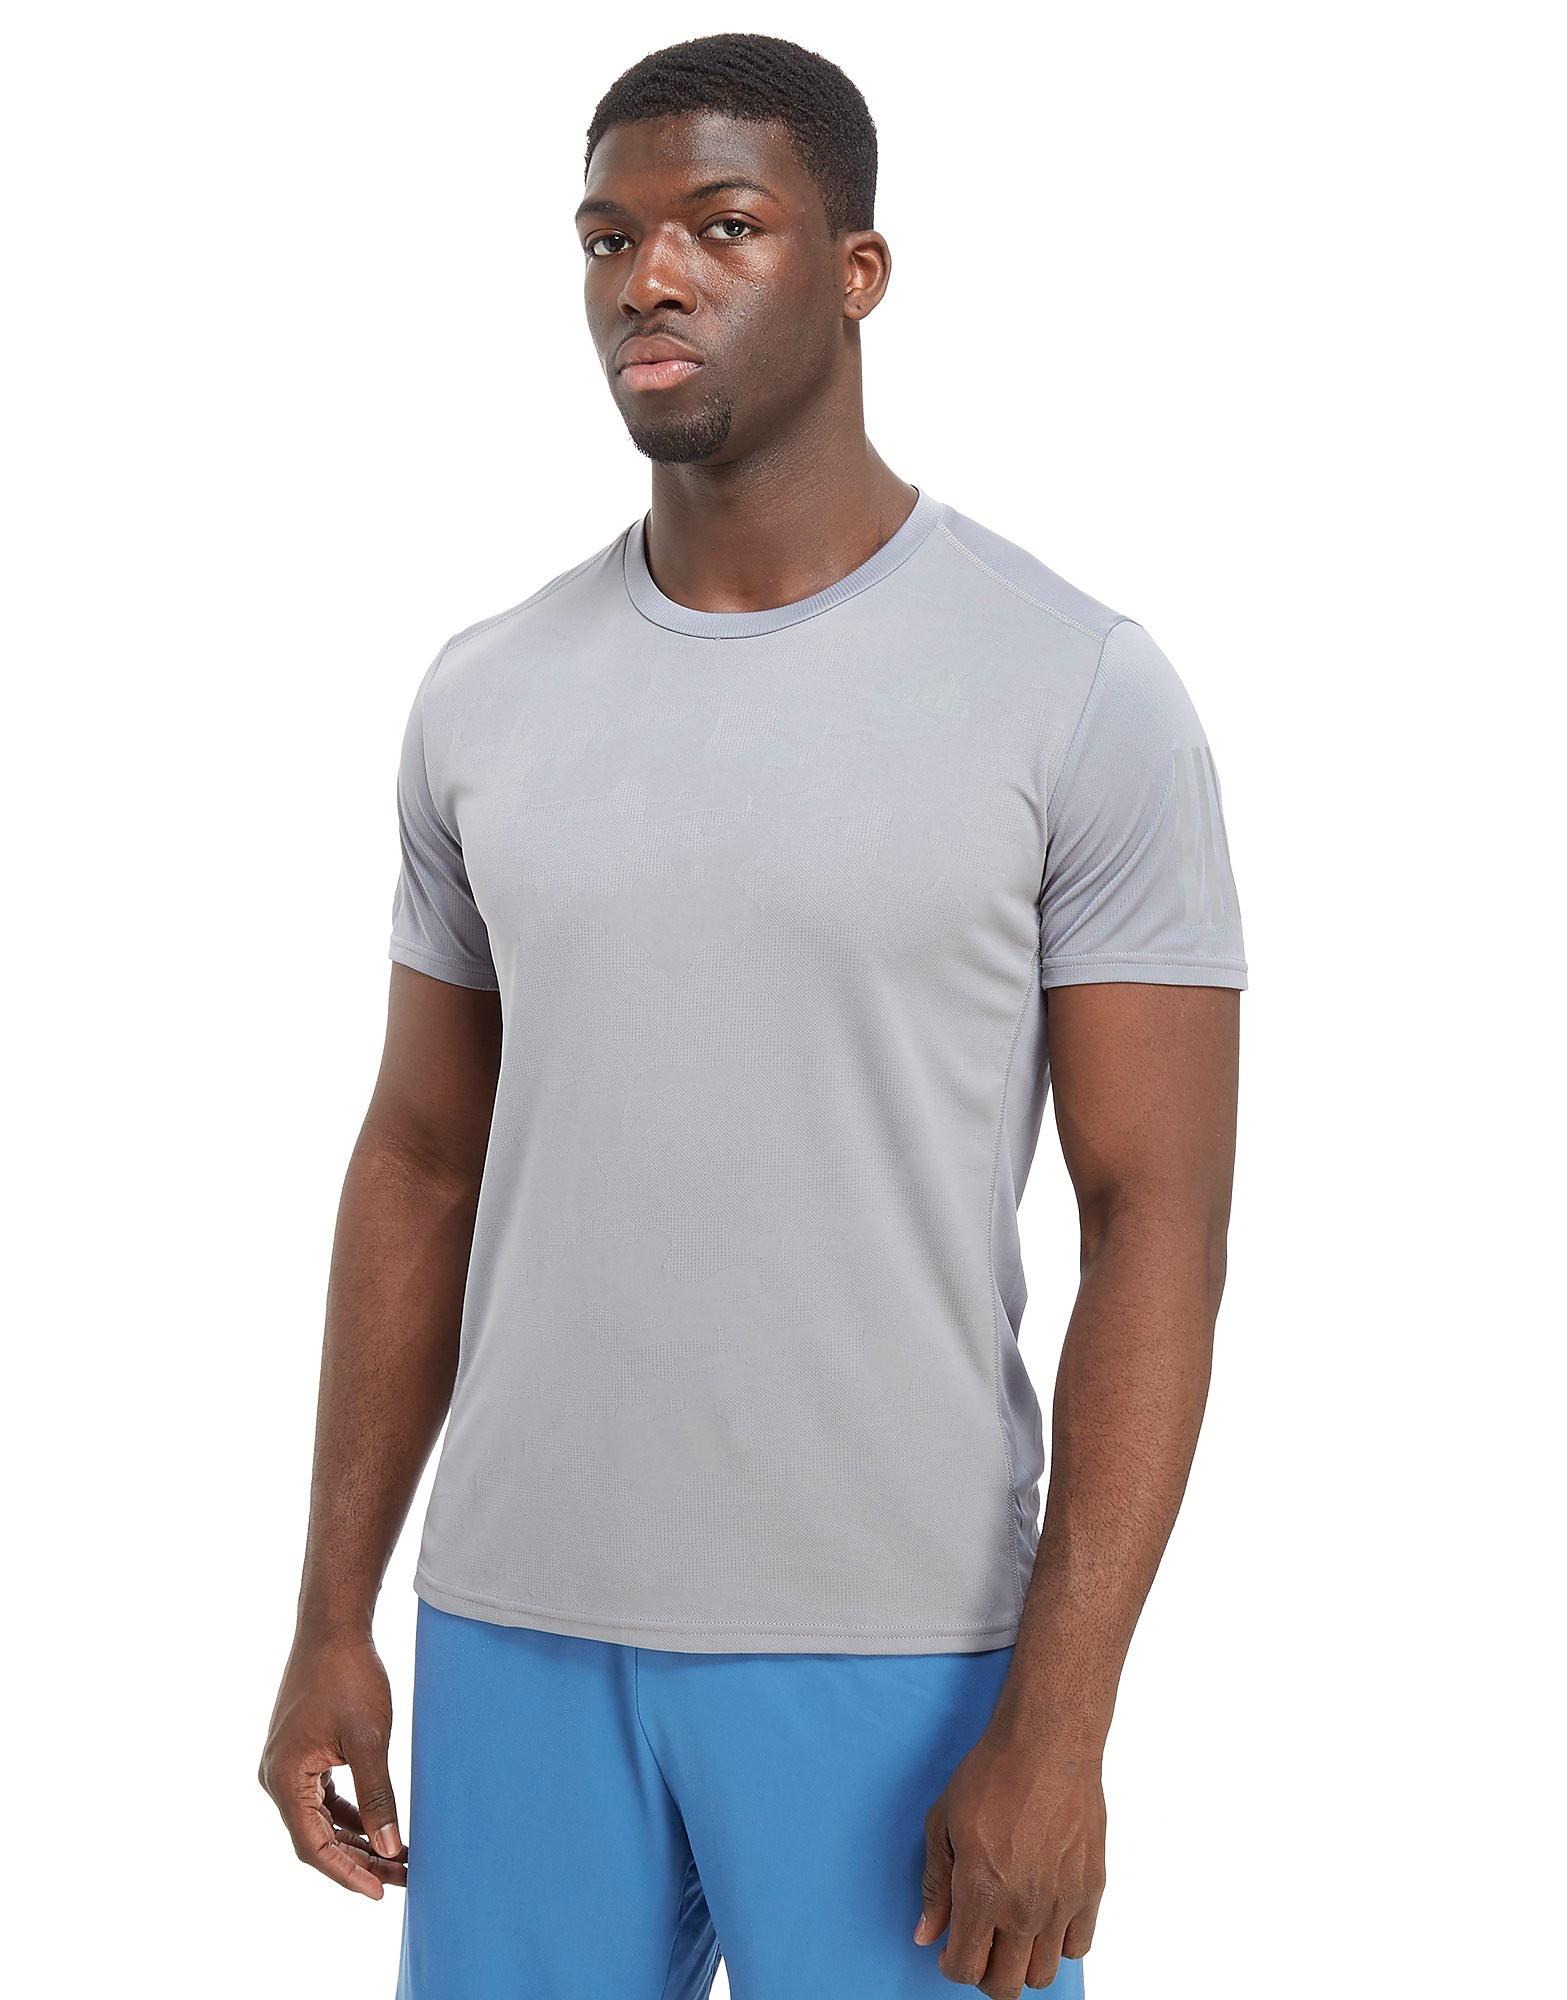 adidas Response Short Sleeved T-Shirt